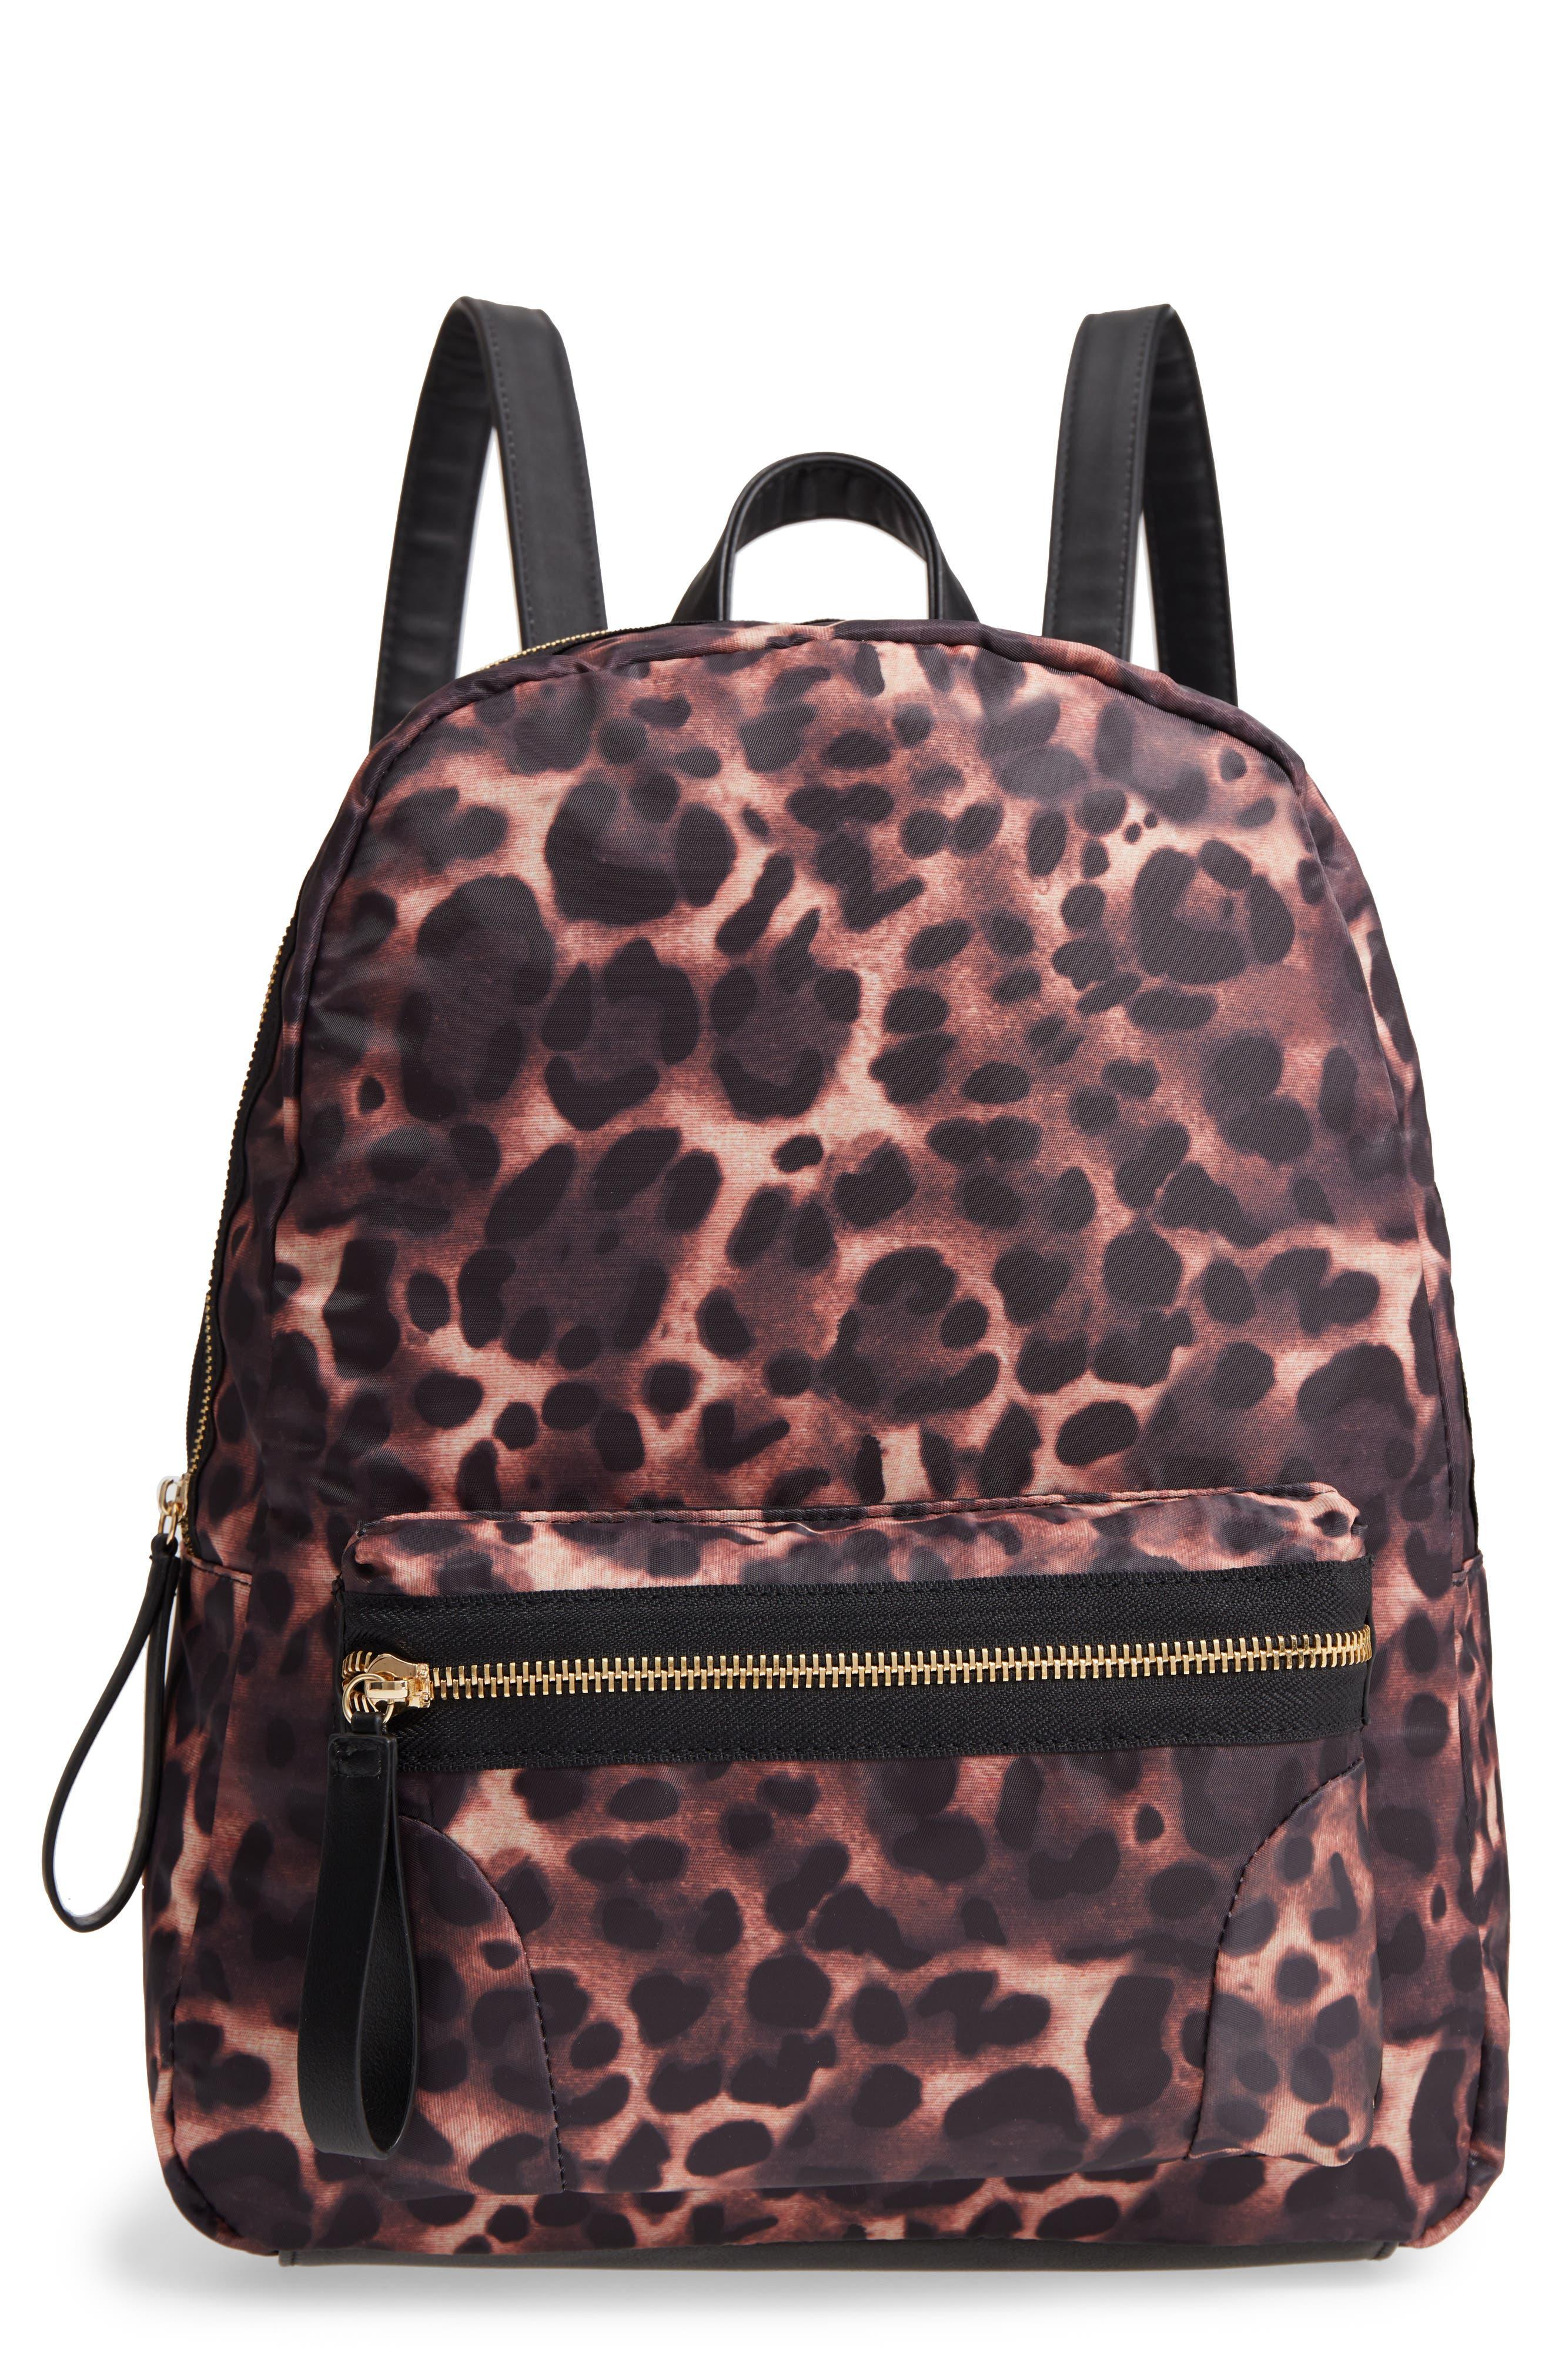 Leopard Print Nylon Backpack,                             Main thumbnail 1, color,                             Leopard